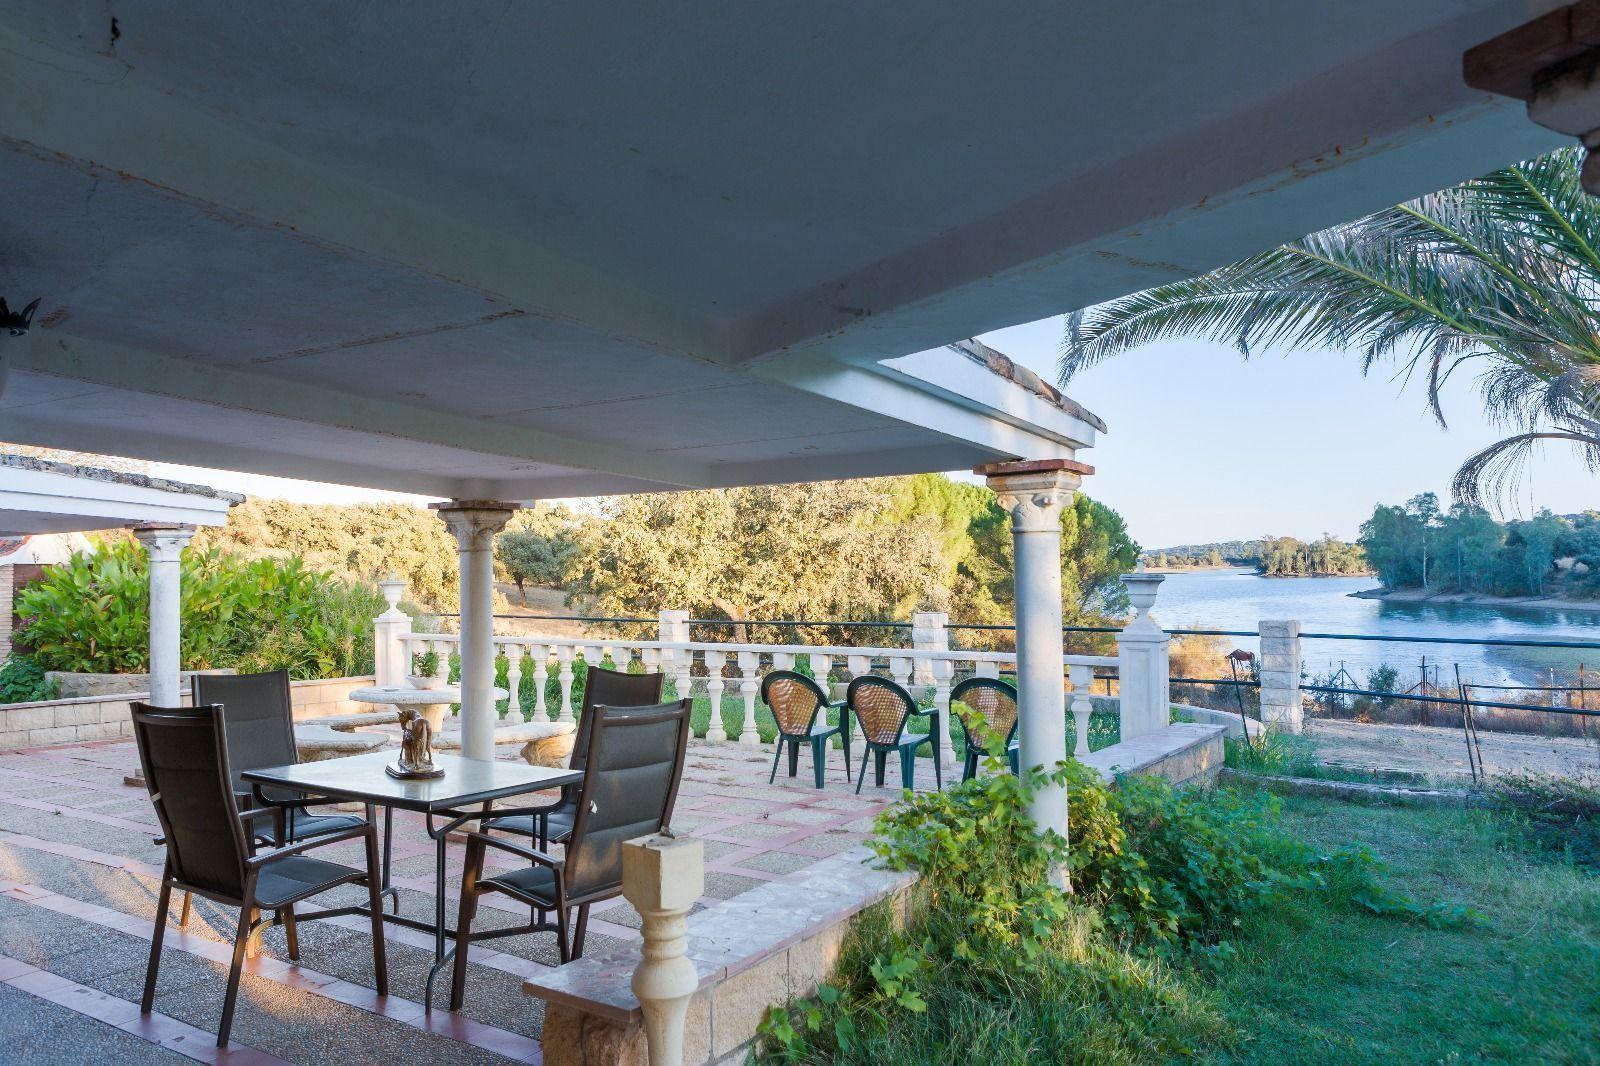 Private Solarium terrace in Lake house